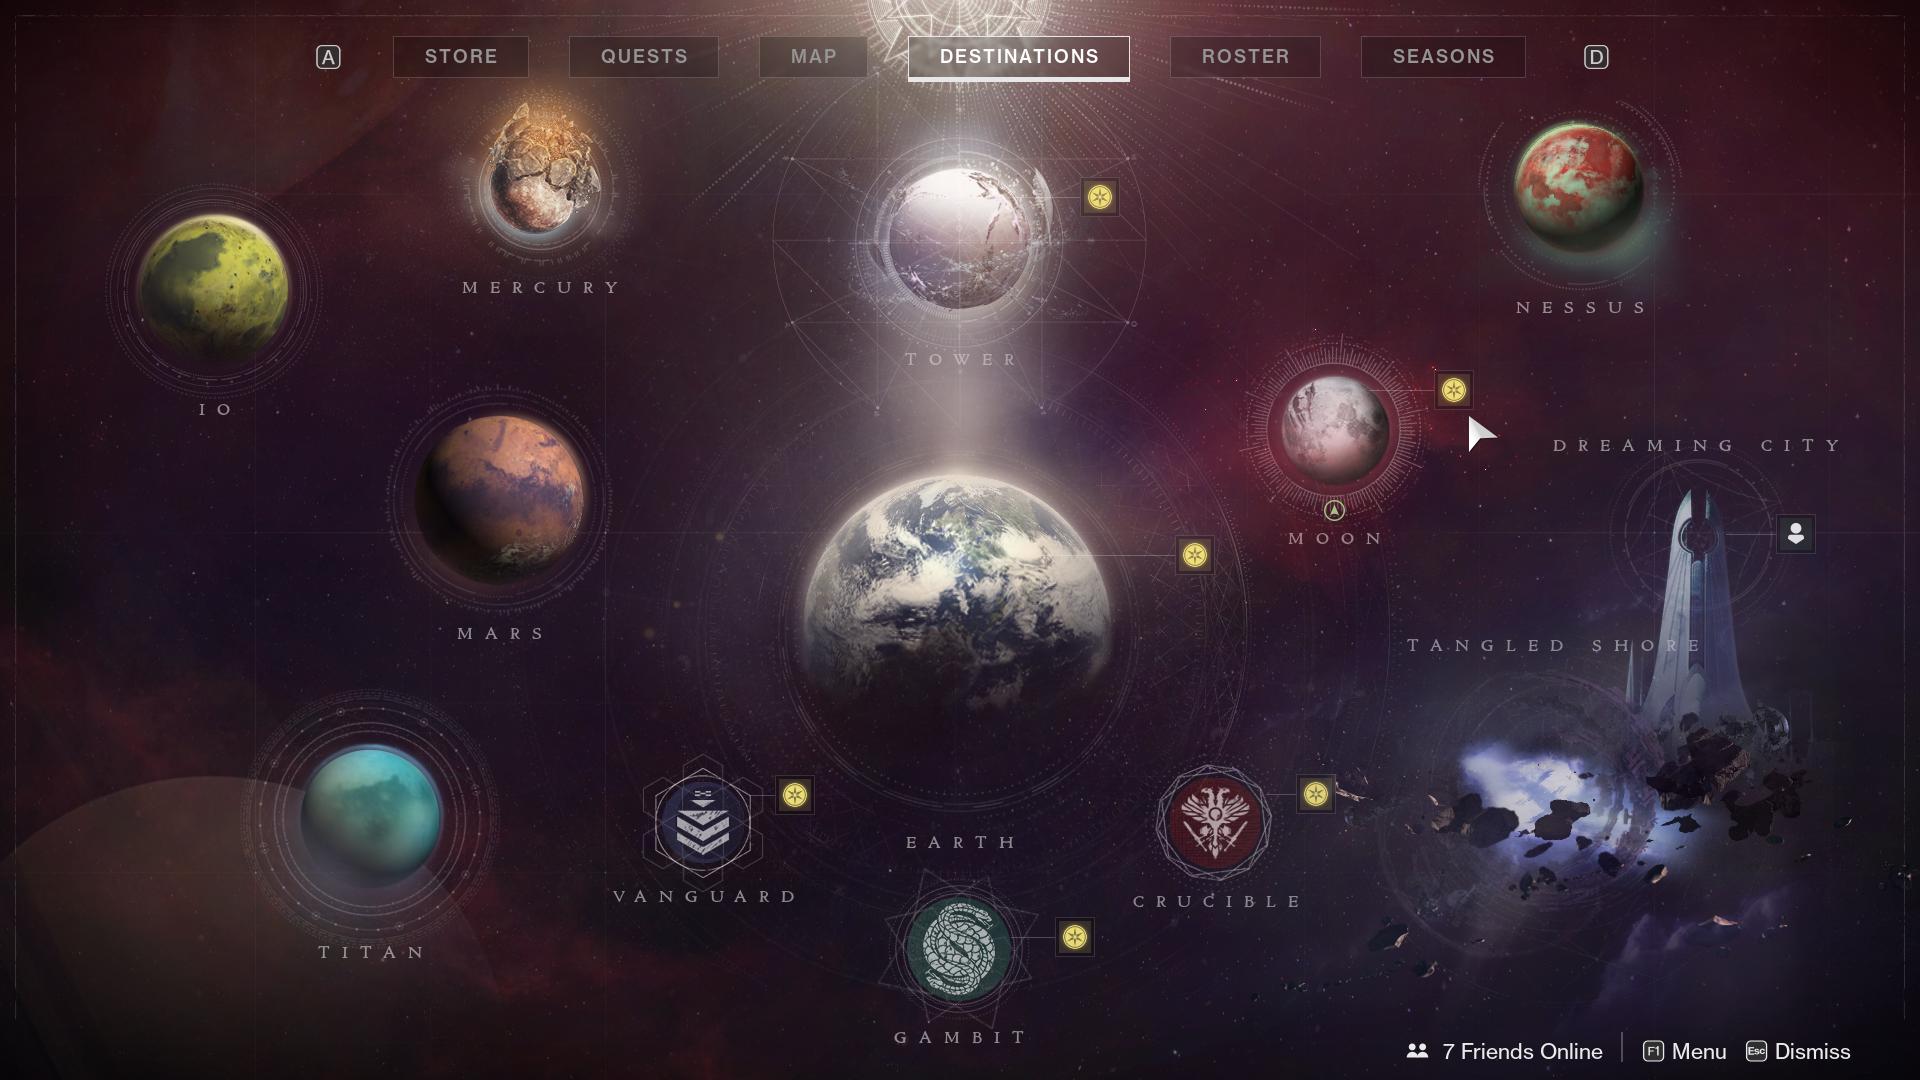 Destiny 2: Shadowkeep 950+ power leveling guide